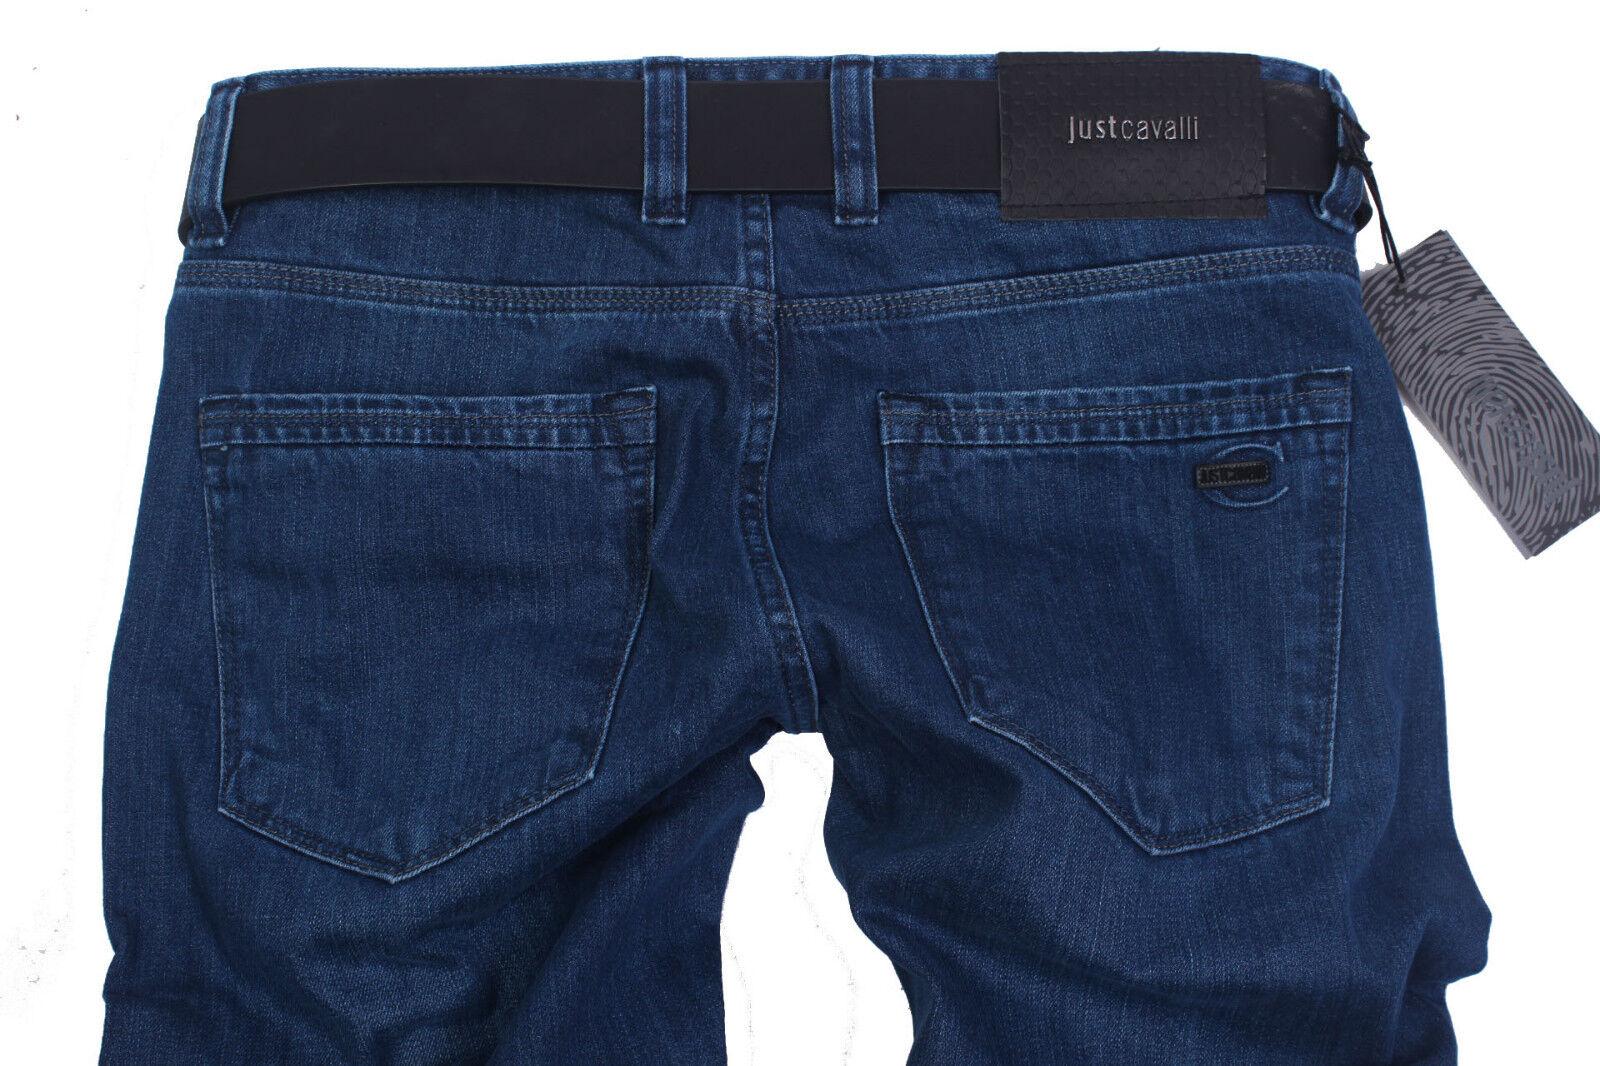 Brand New Just Cavalli   Men's Jeans+Gift Belt 7028 Size 30